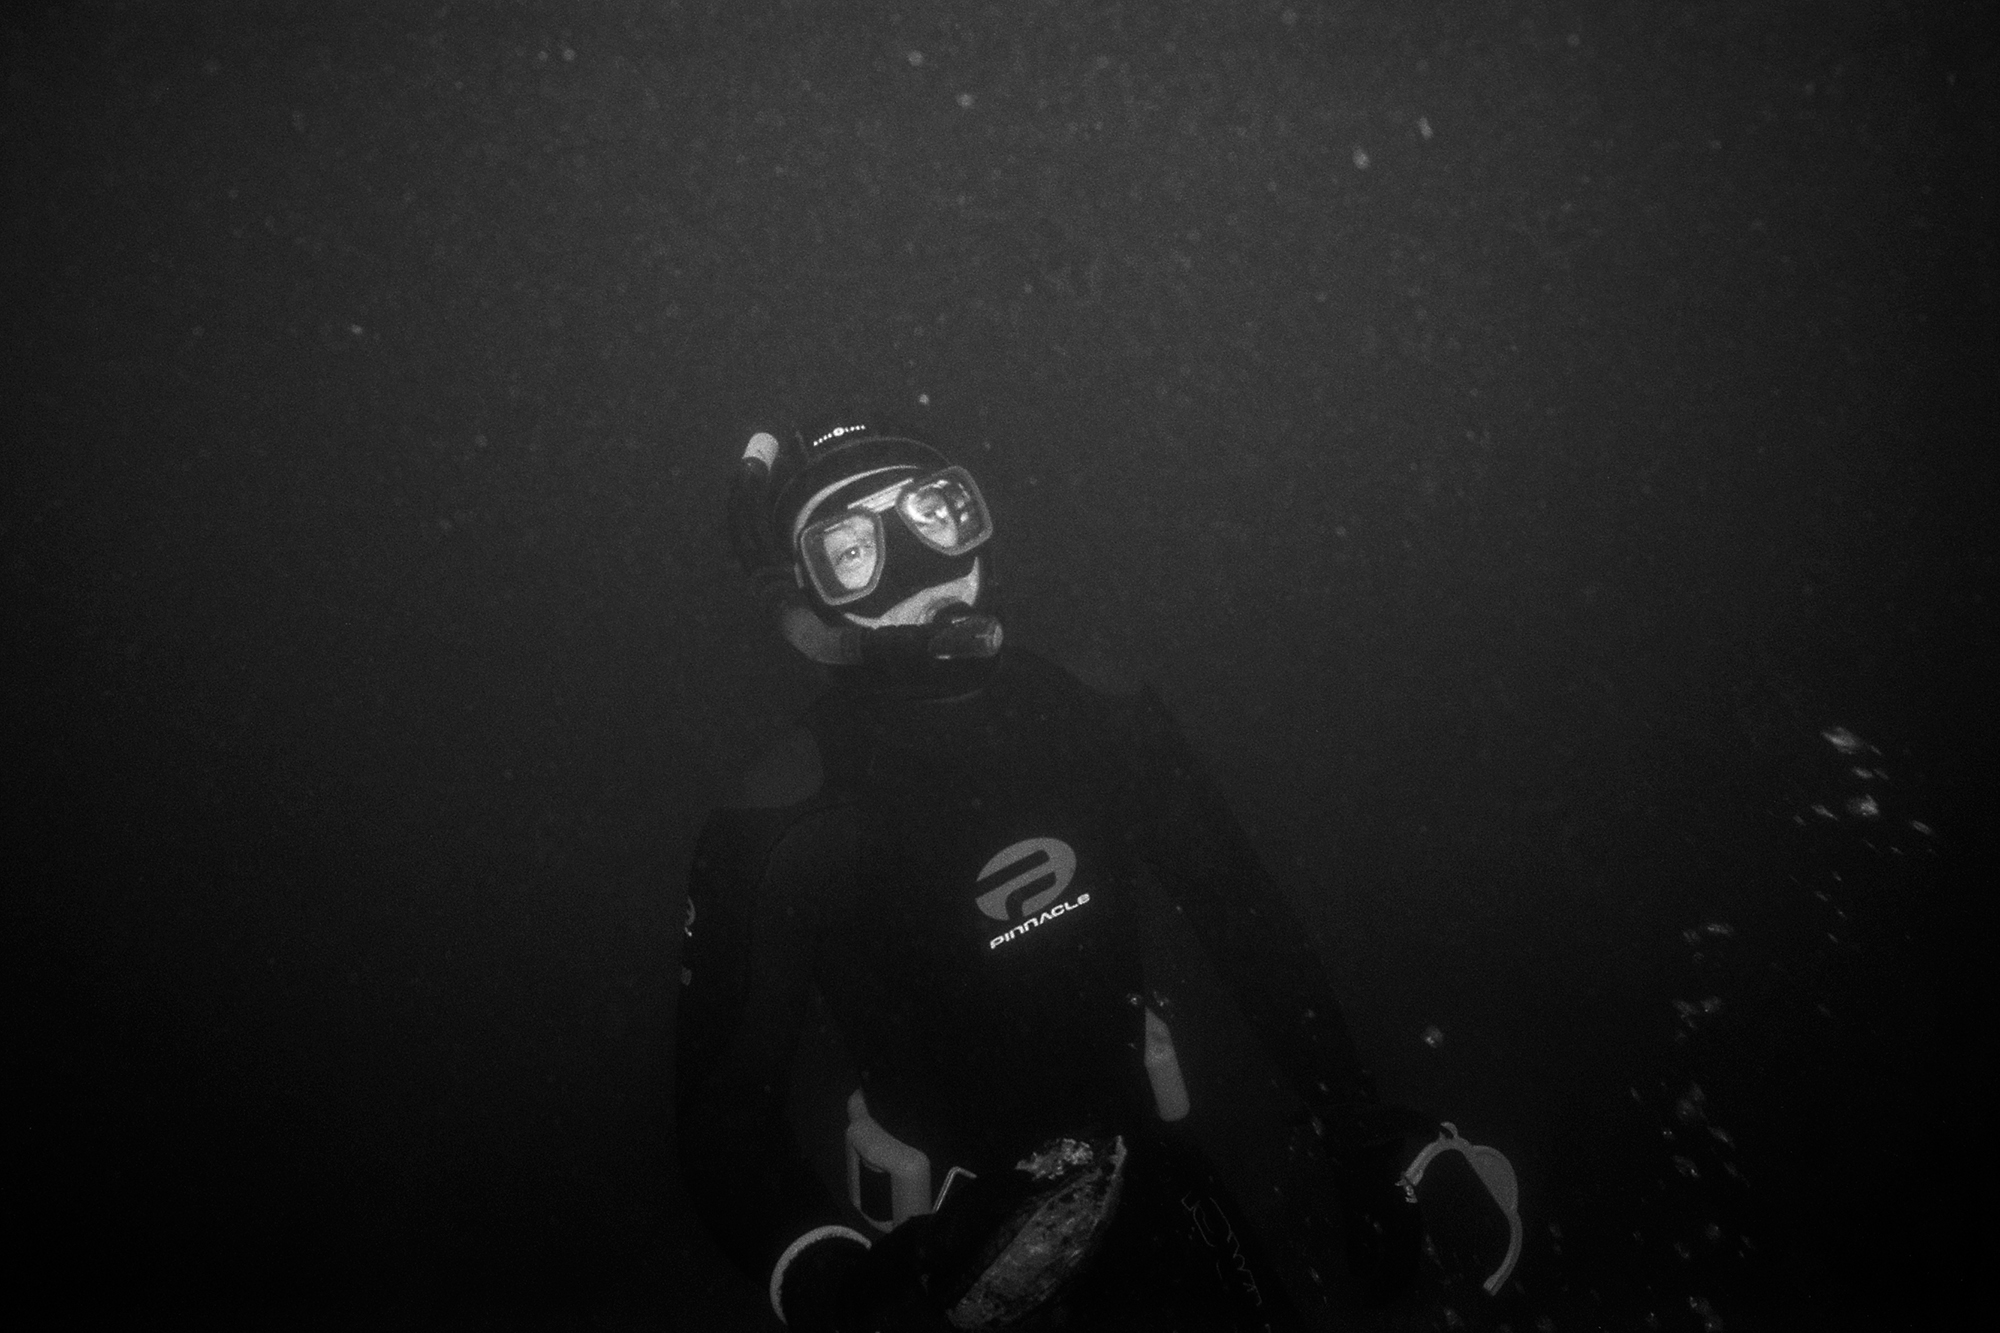 Abalone_dive_077.jpg